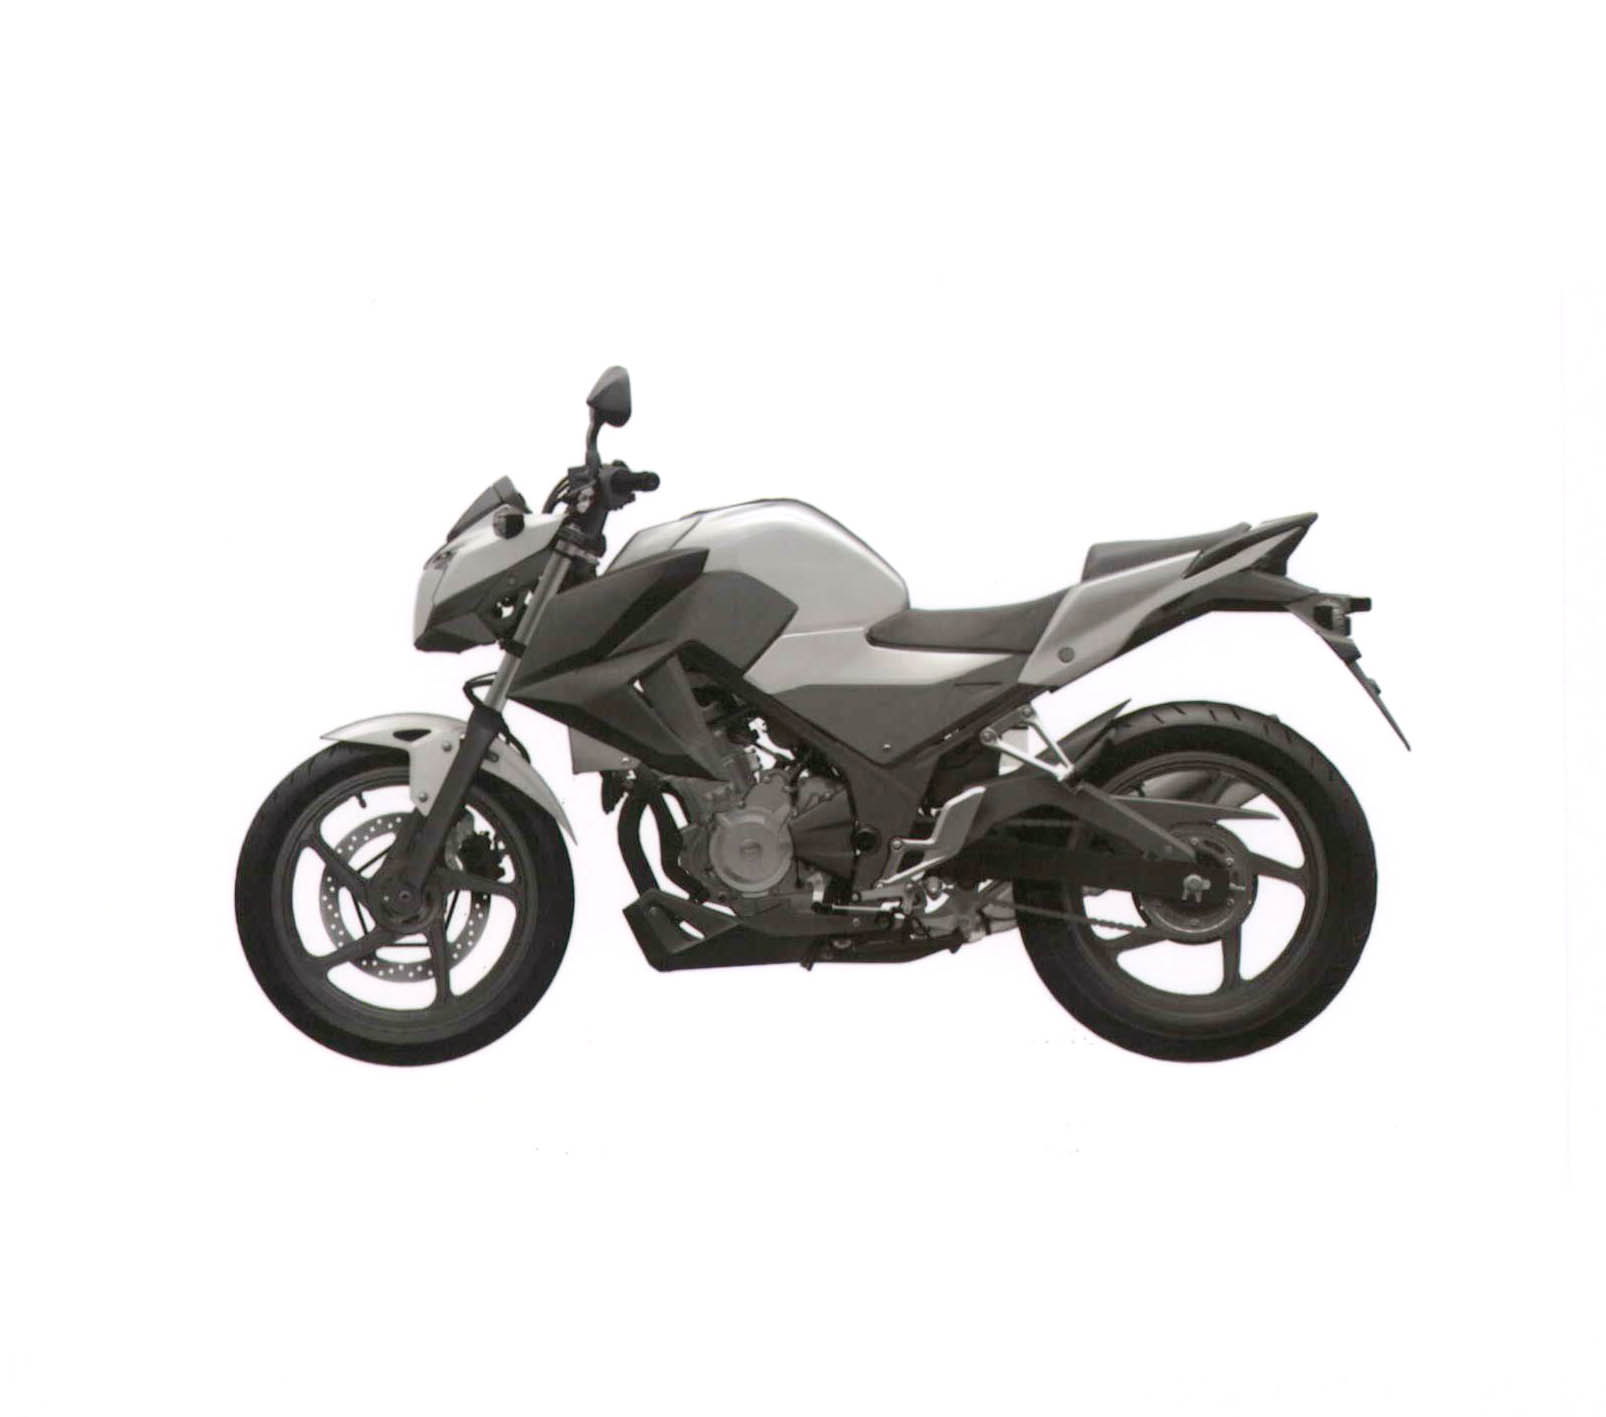 Honda's naked CBR300R